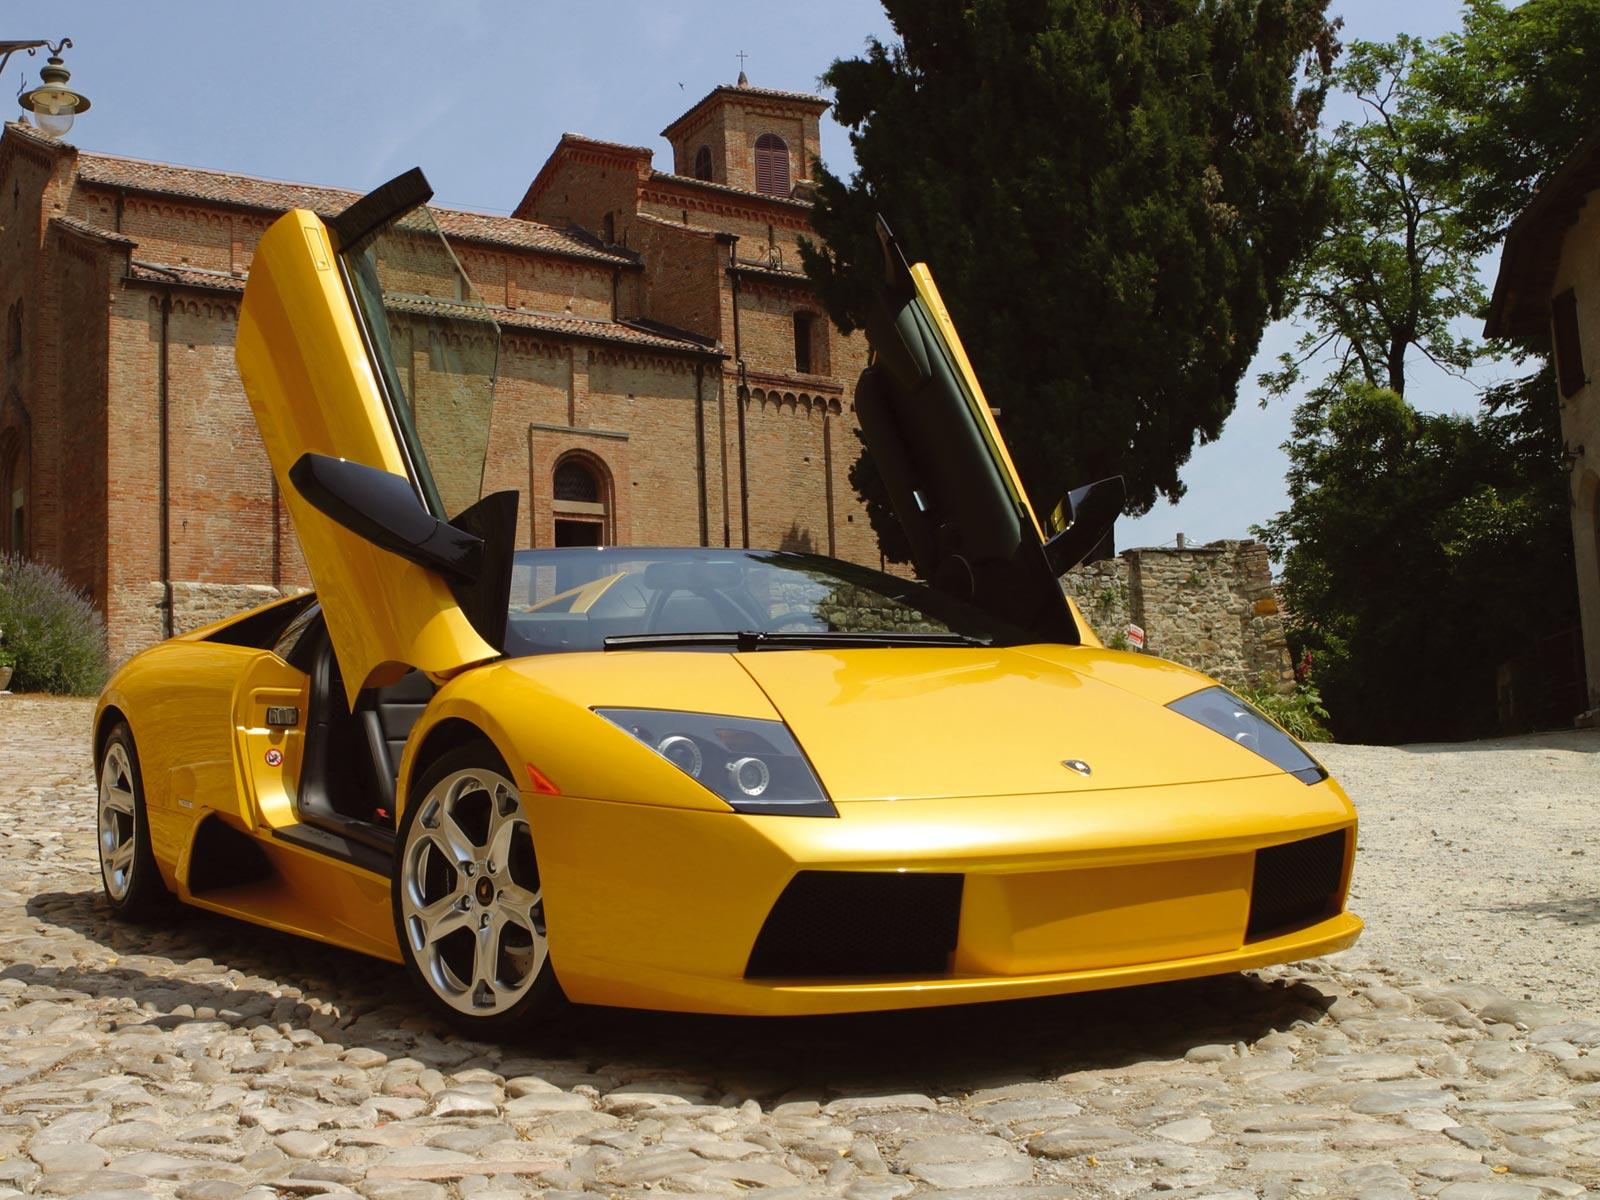 2006 Murcielago Roadster (c) Lamborghini